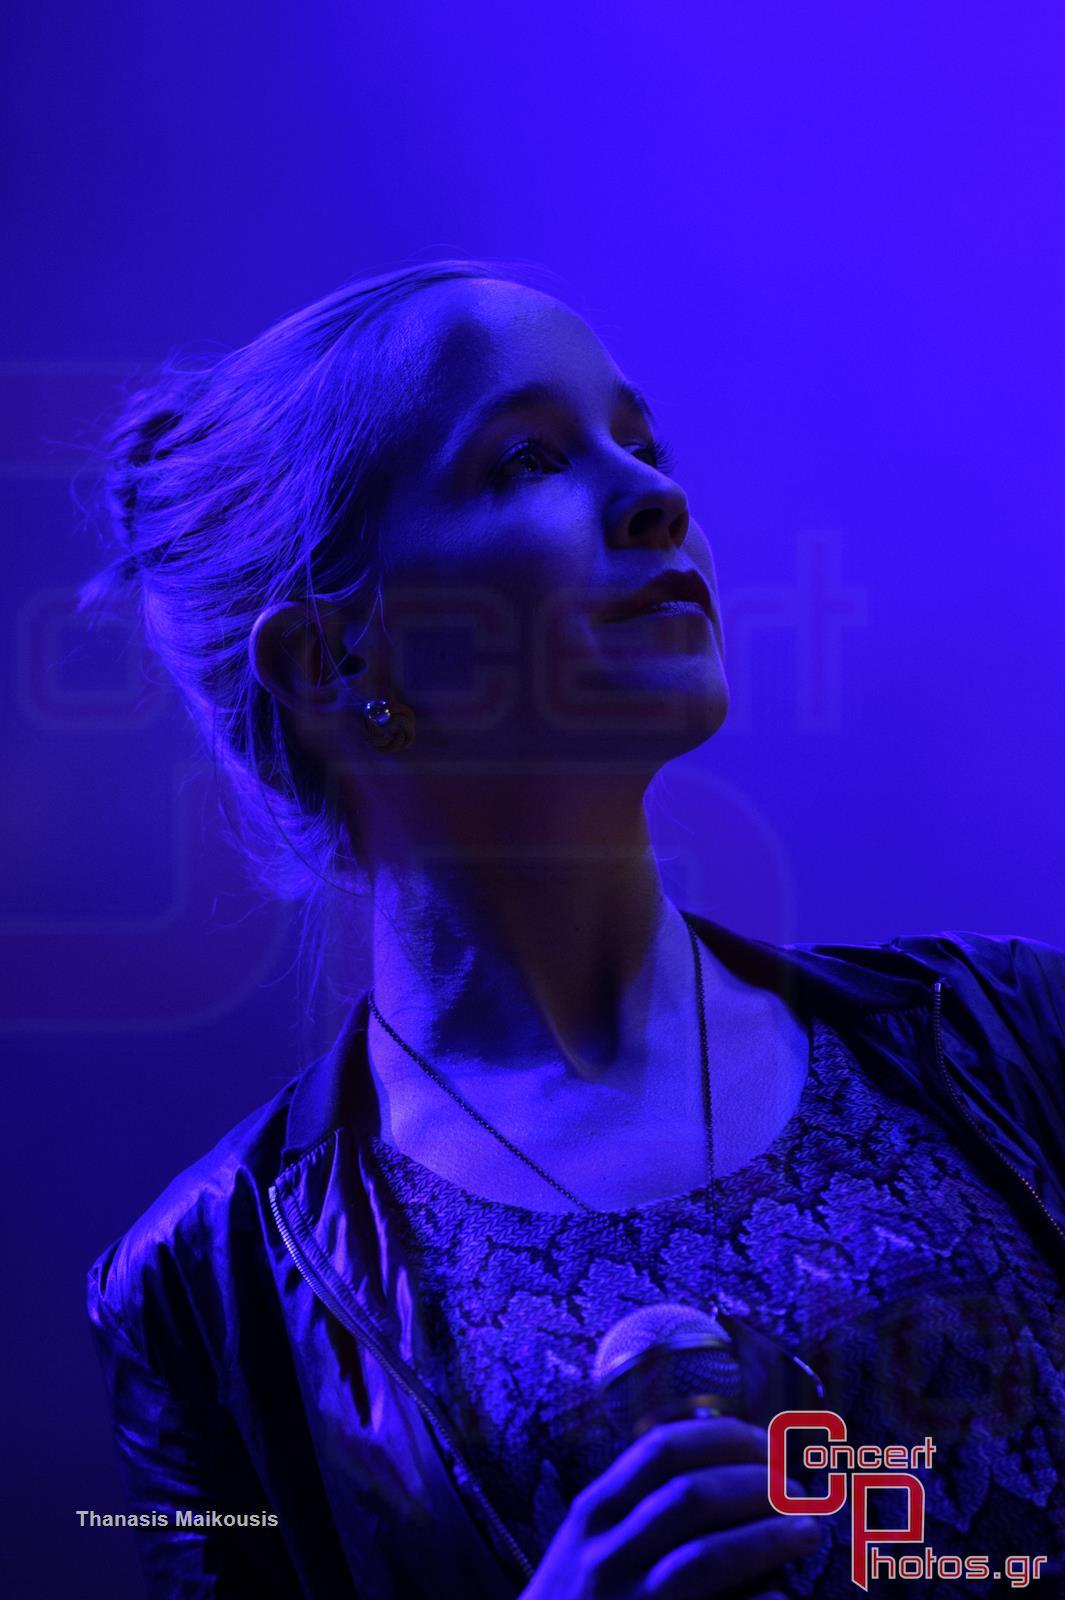 Active Member - Τραγούδα μας να φύγει το σκοτάδι- photographer: Thanasis Maikousis - concertphotos_-5756